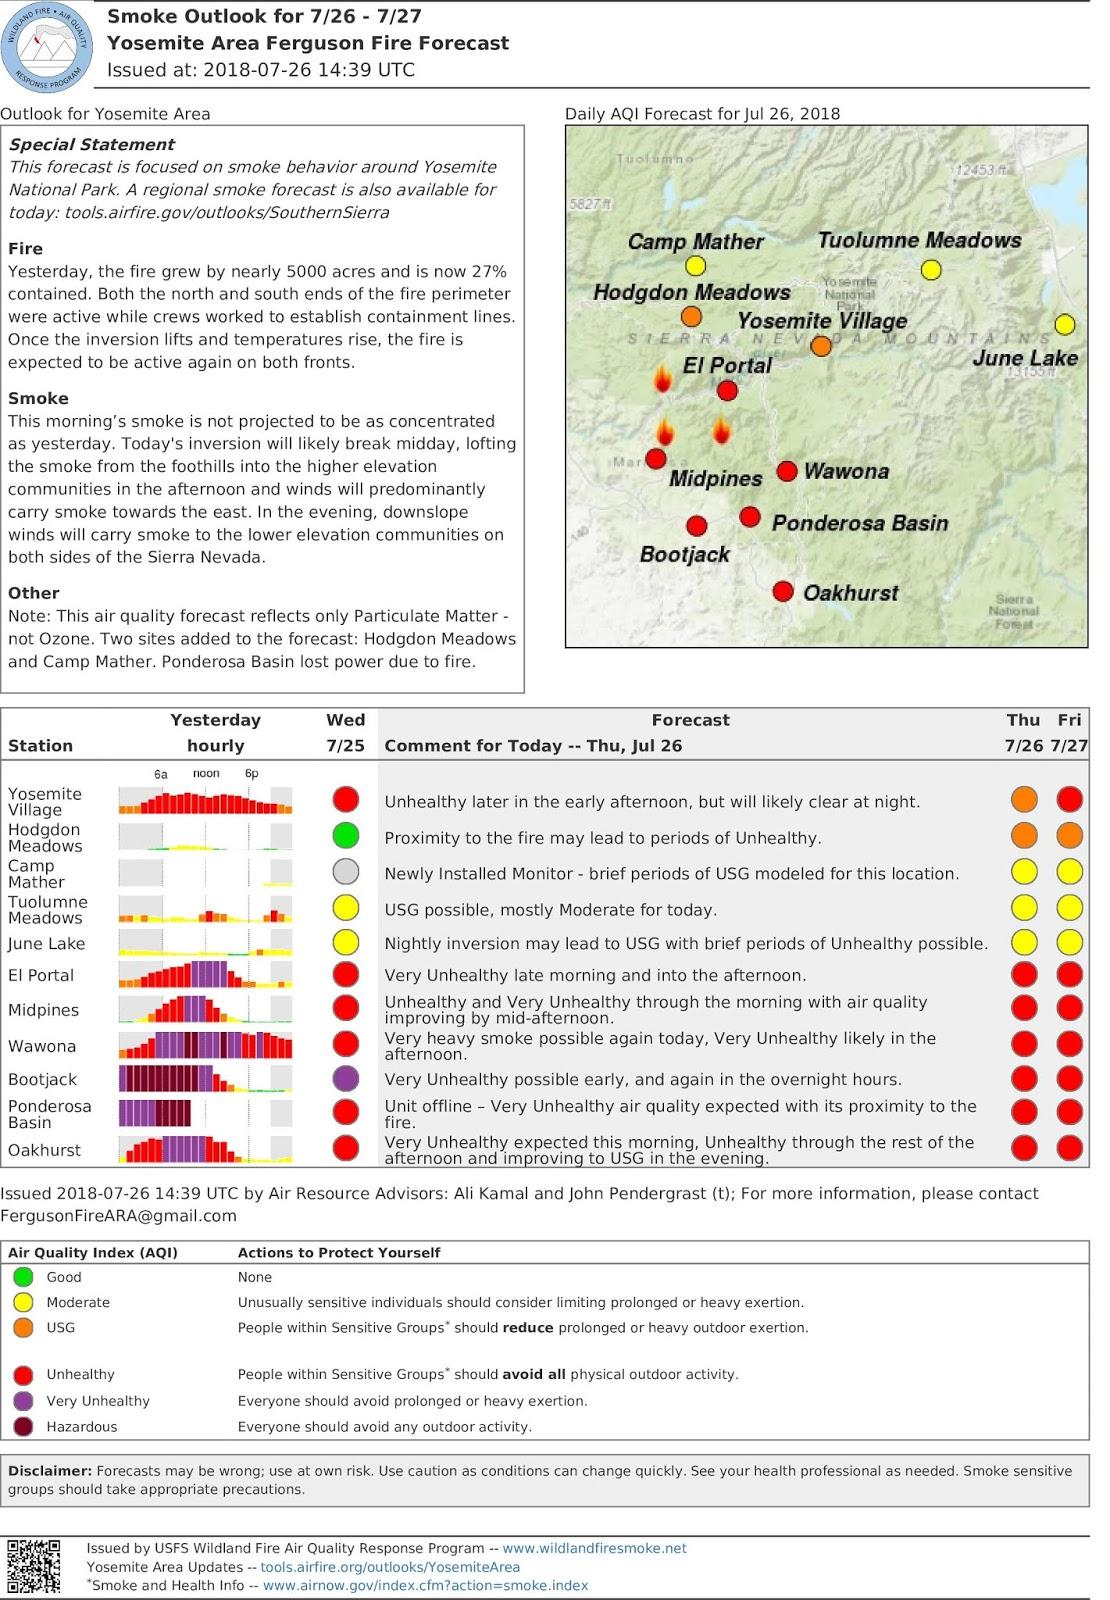 thursday july 26 2018 fergusonfire yosemite area smoke air quality outlook